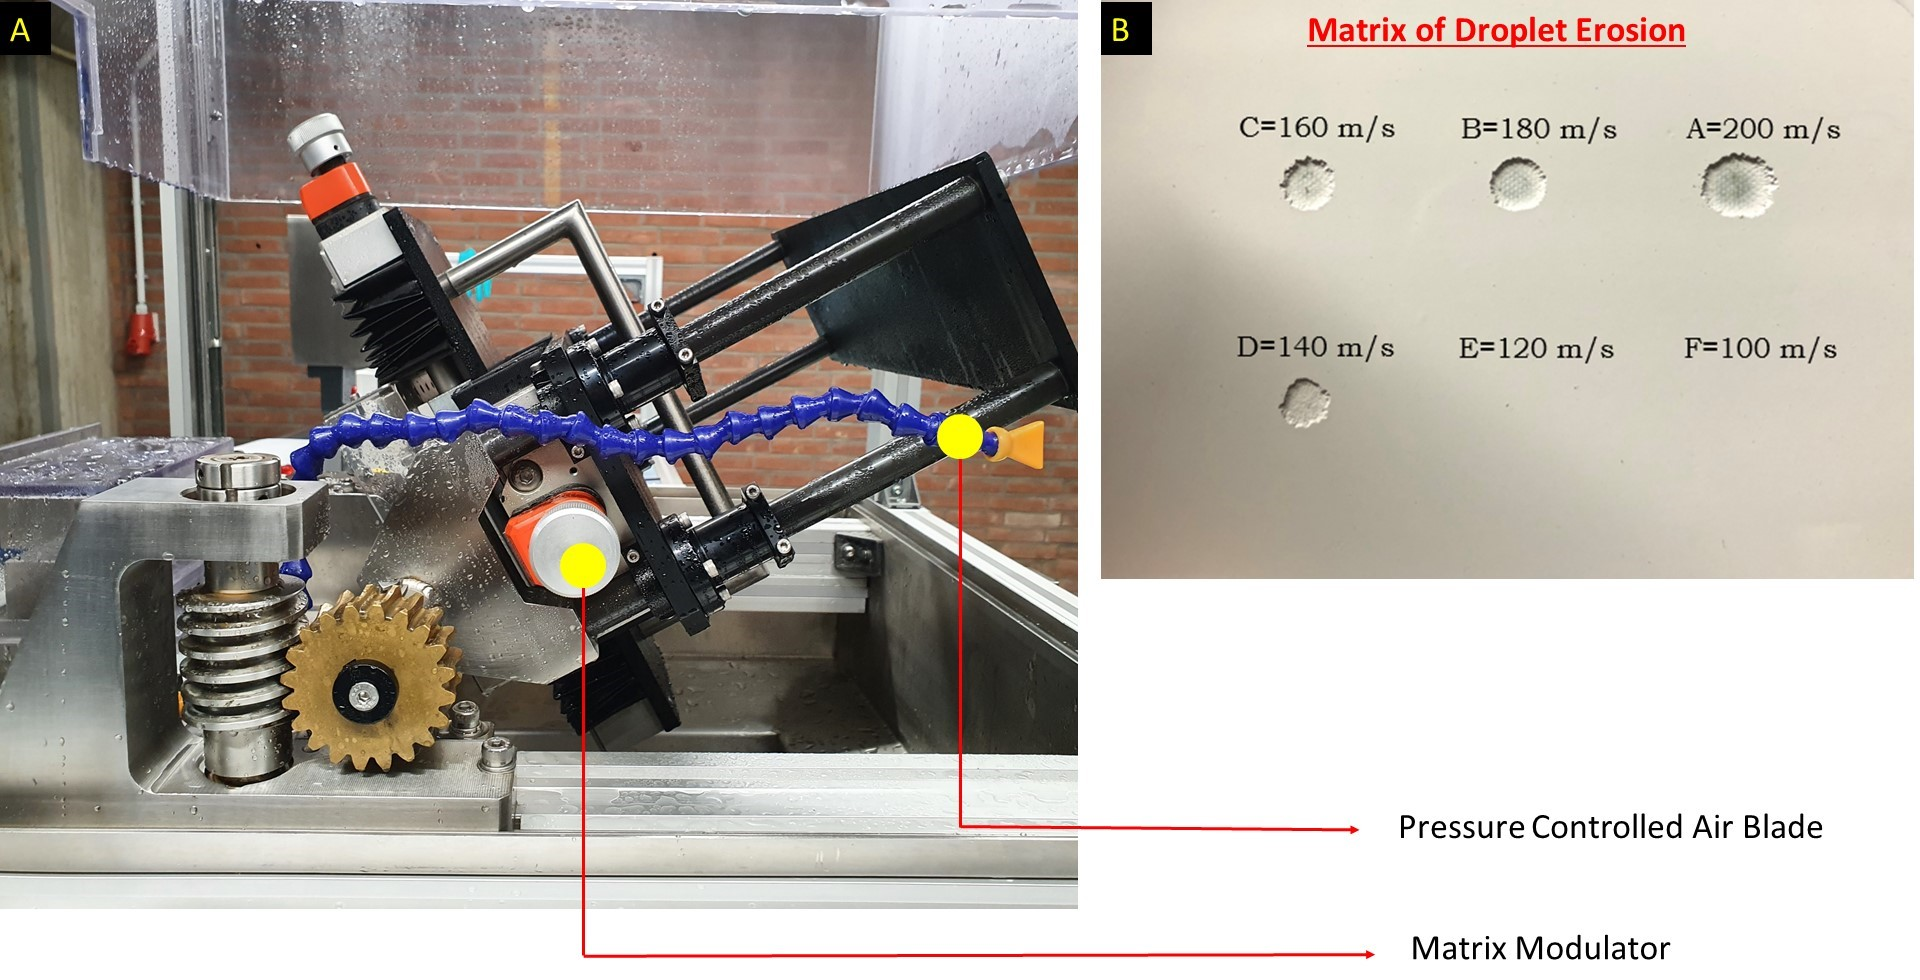 Matrix Modulator